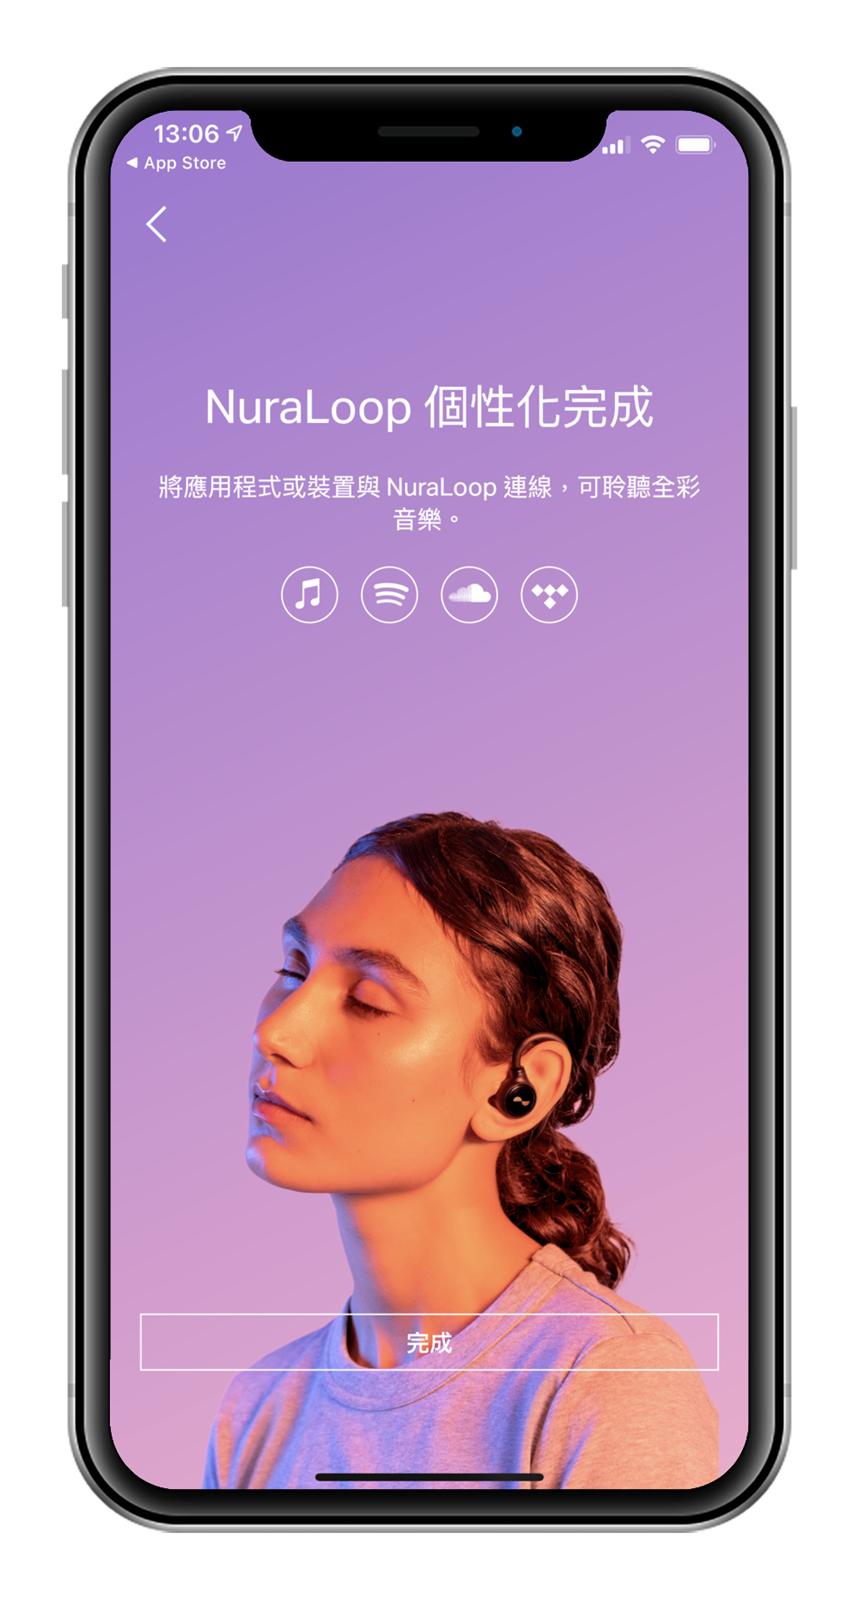 NuraLoop 隨型個人化智慧耳機、ANC 主動降噪 +個性化音場設定、16 小時長效電力,還有快充 10 分鐘播放 2 小時 @3C 達人廖阿輝